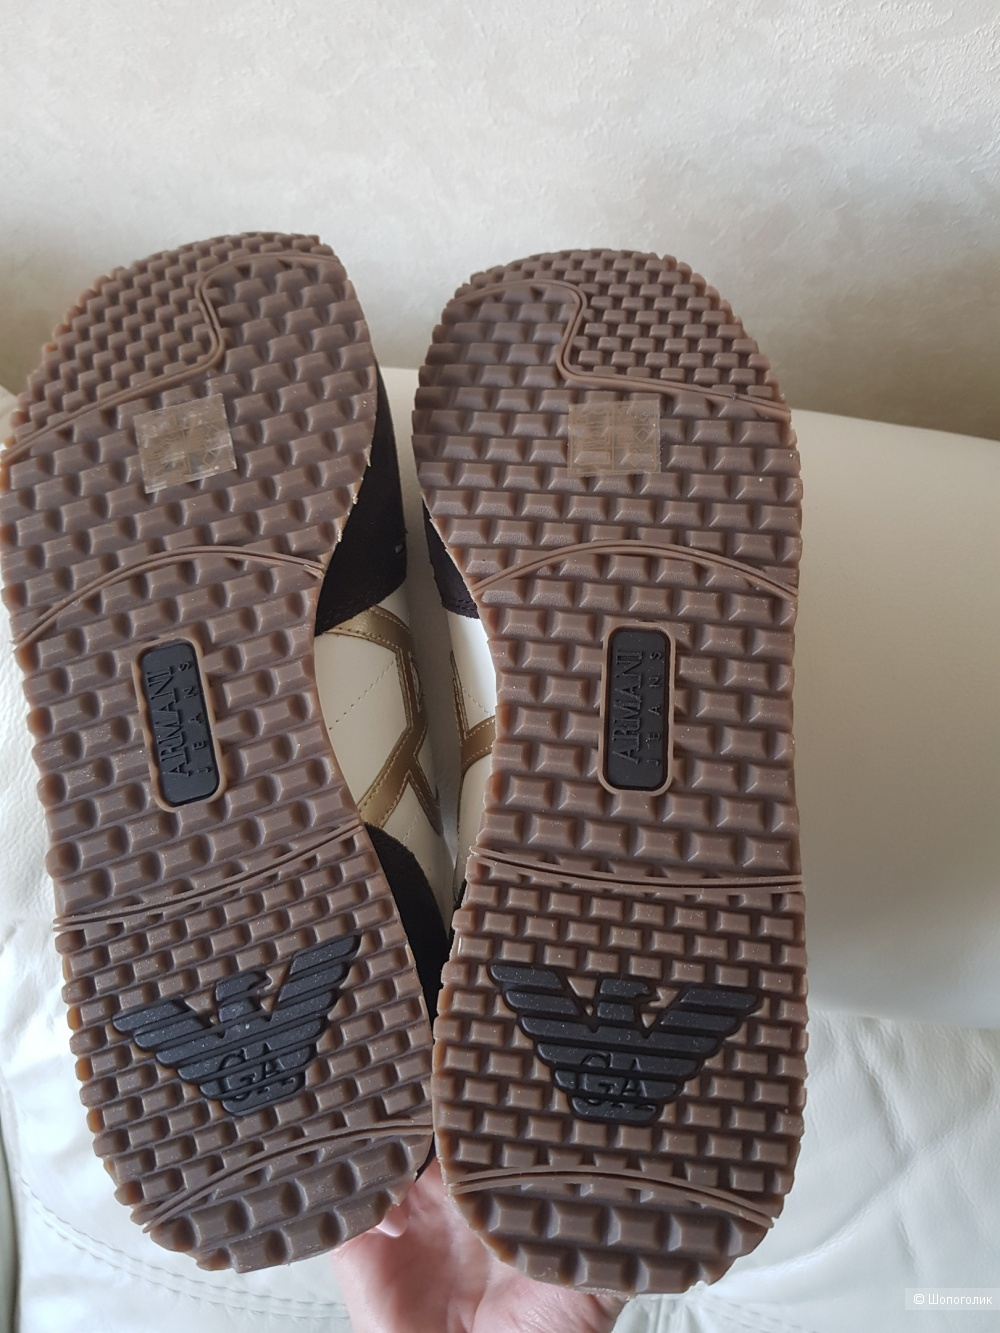 Кроссовки Armani Jeans Размер 10,5 (44-44,5)